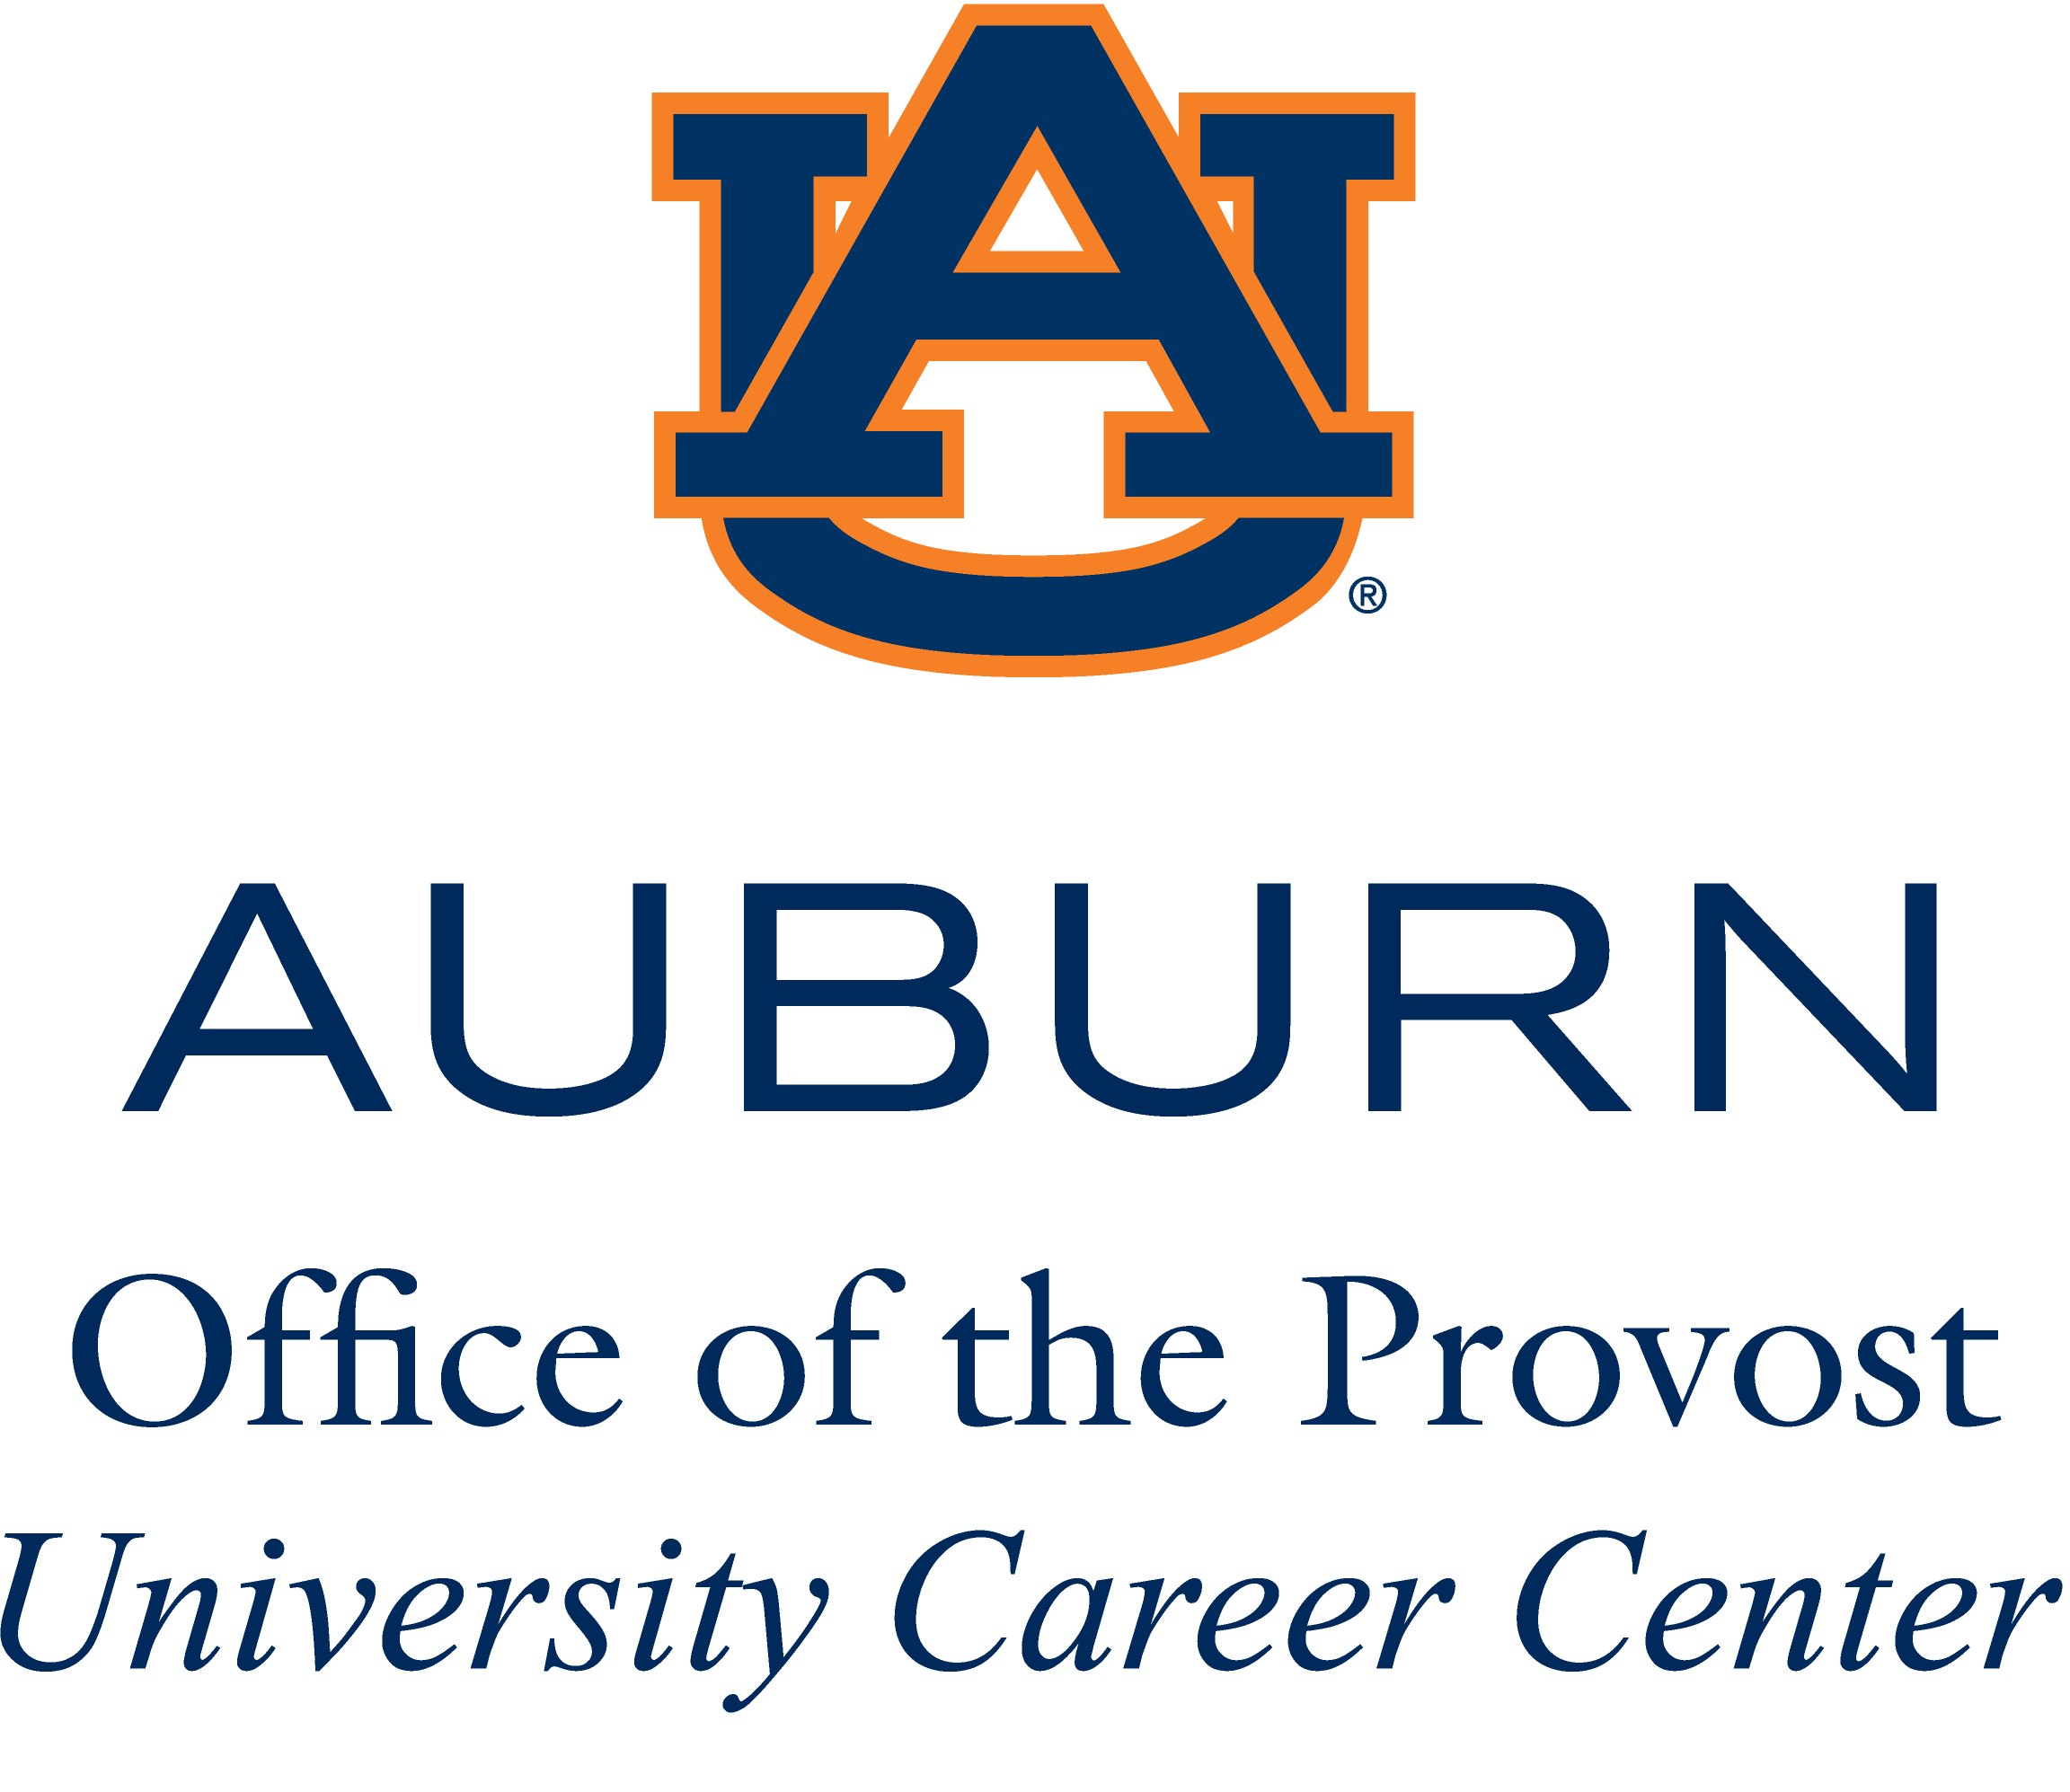 Auburn Office of the Provost Career Center Image